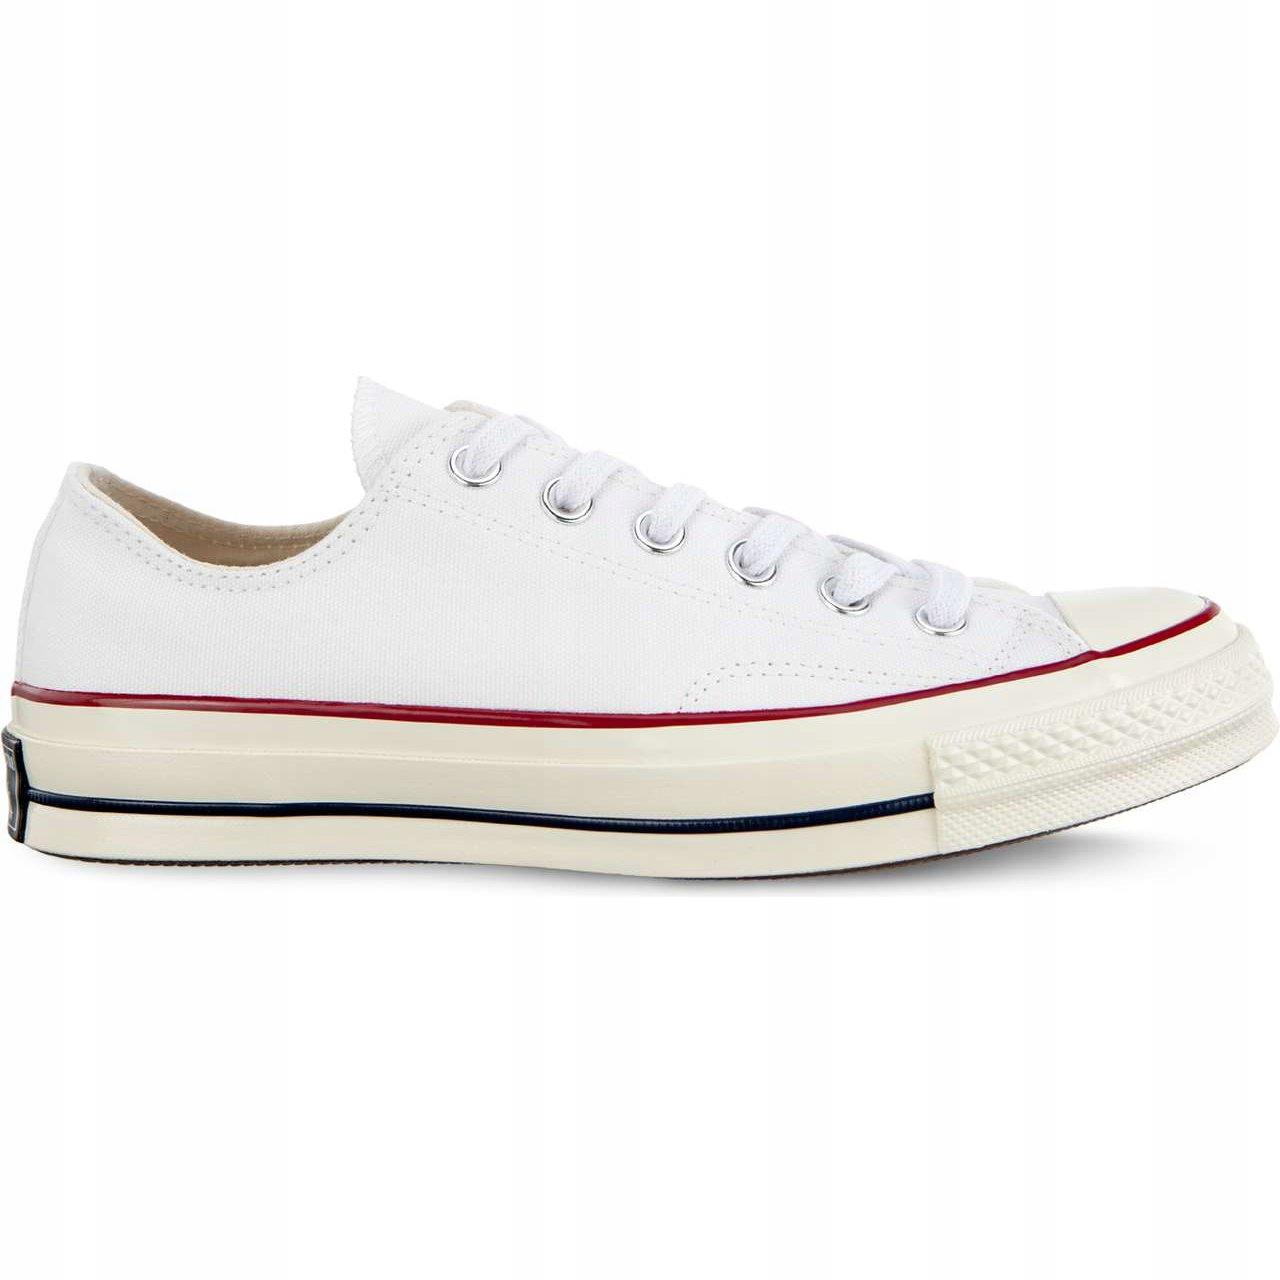 Converse trampki damskie białe tekstylne r.36,5